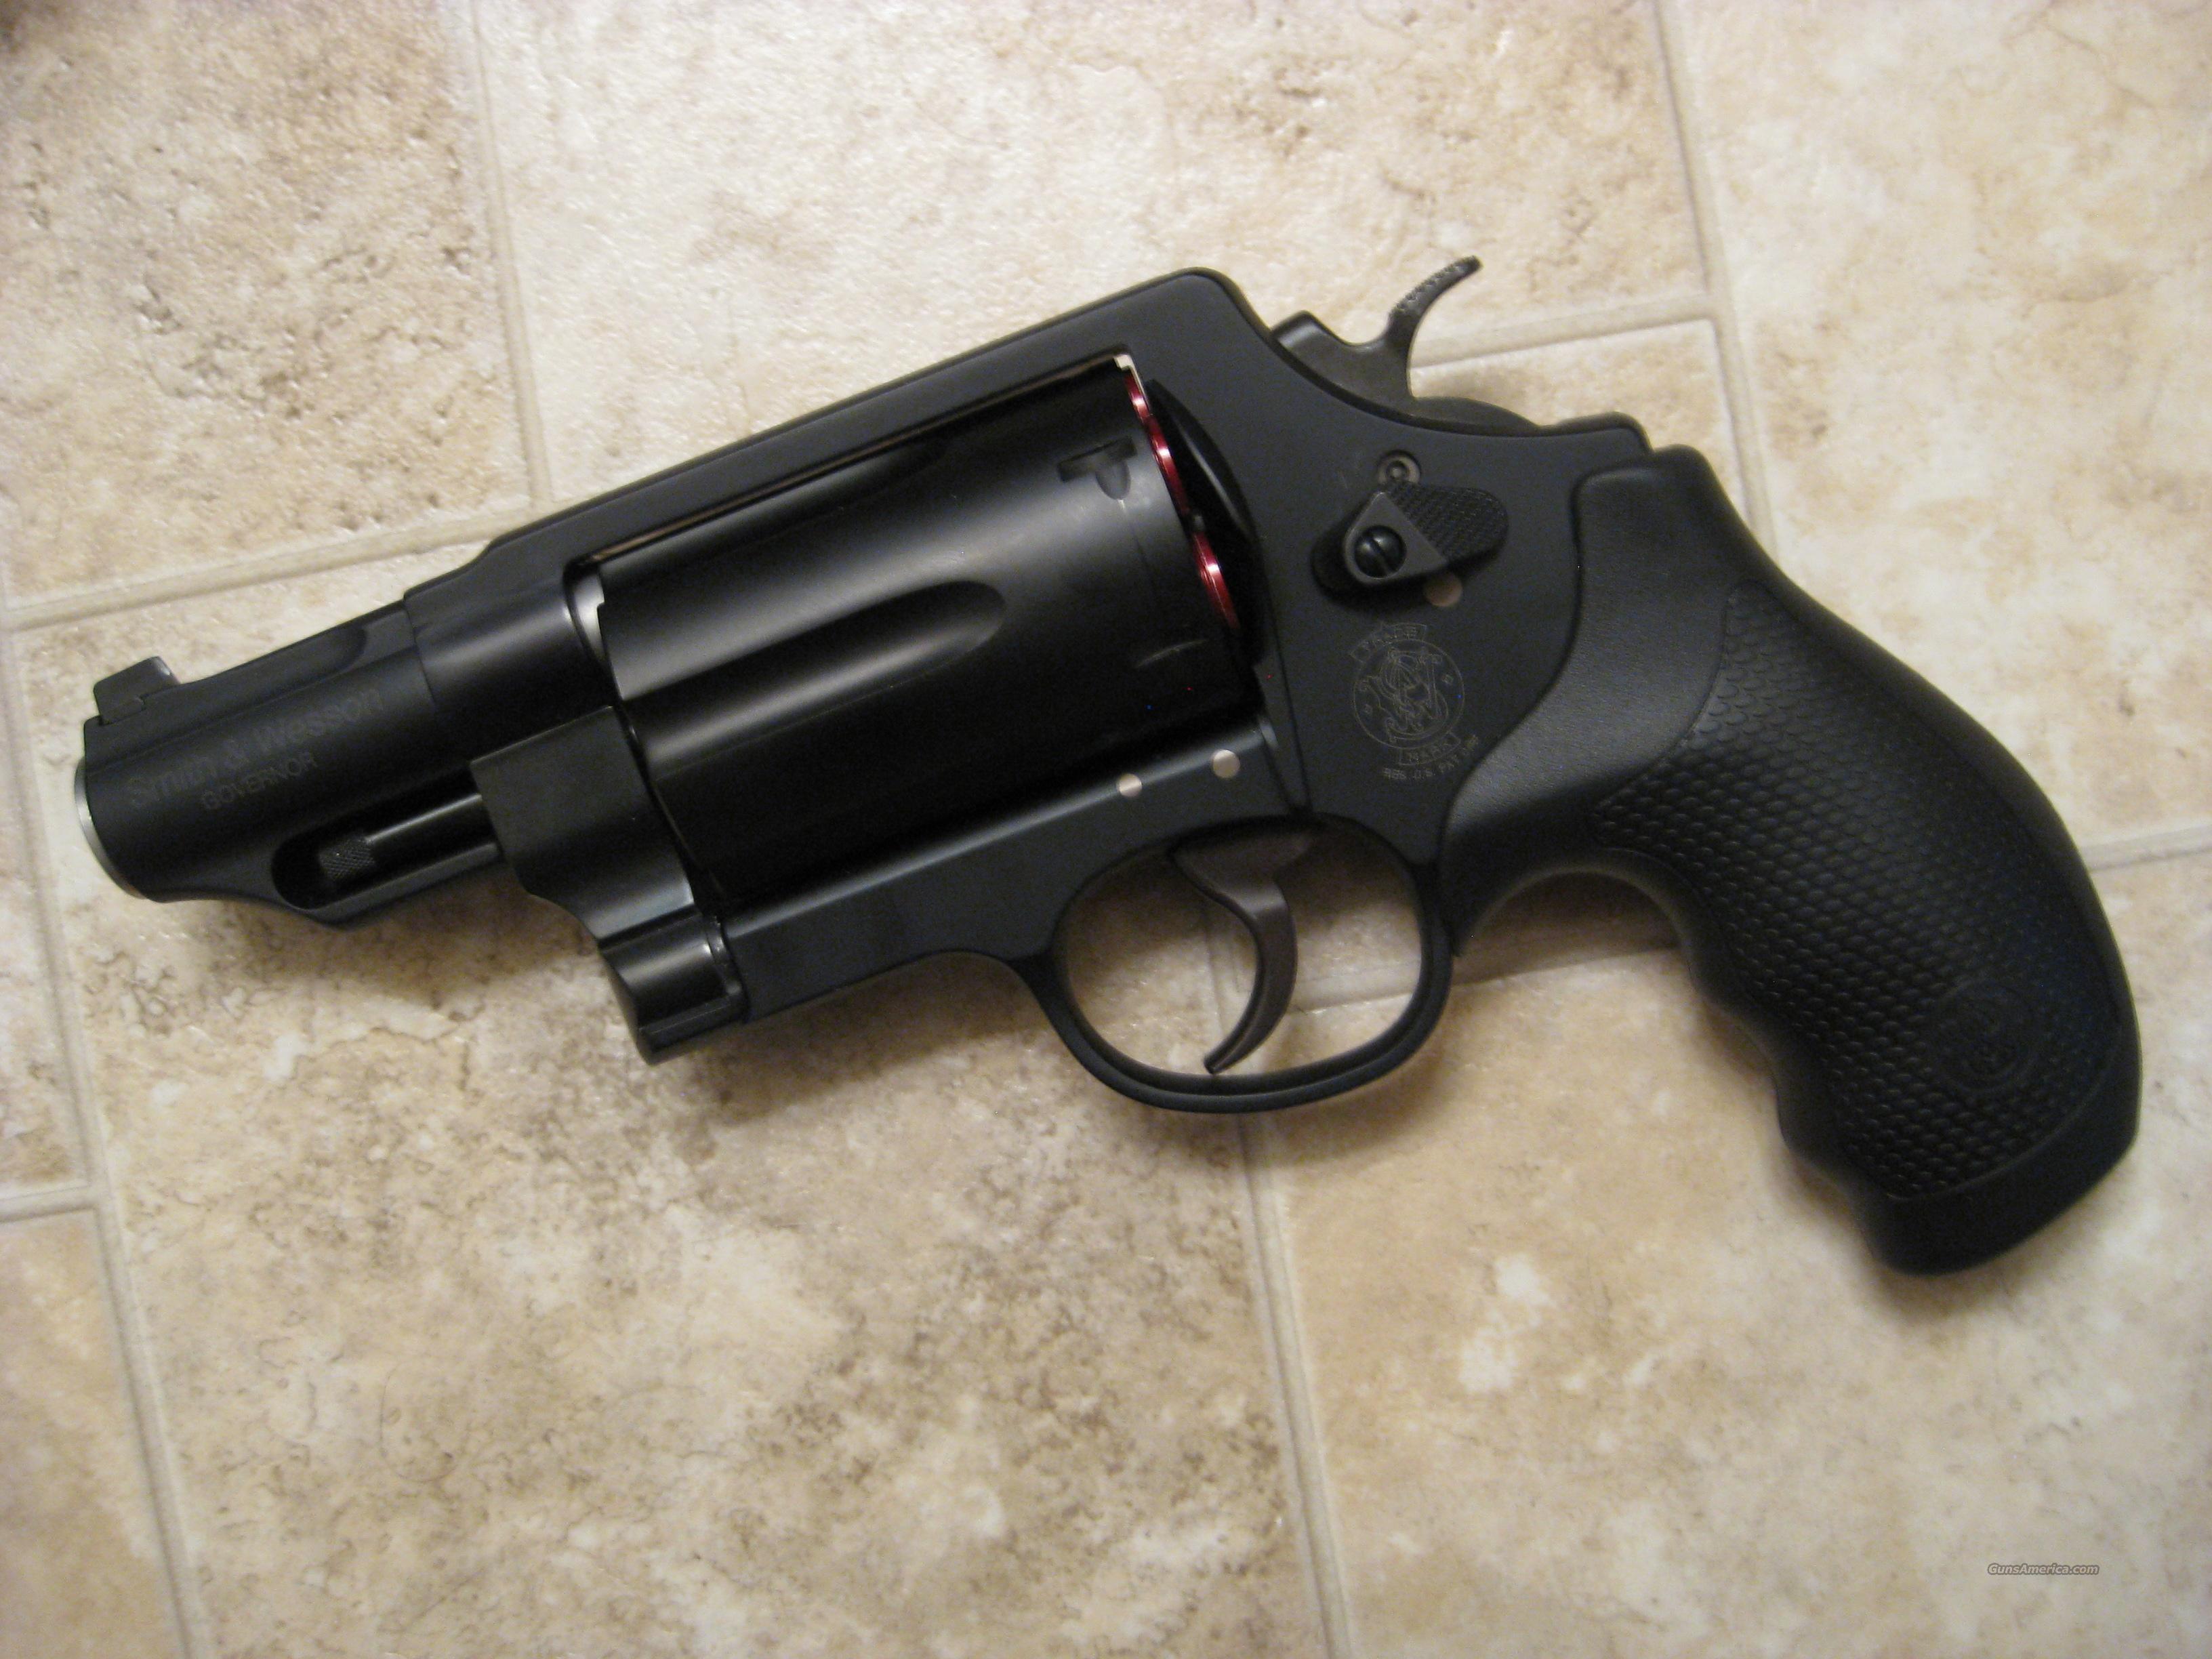 S Amp W Governor Revolver 45lc 410 45acp For Sale